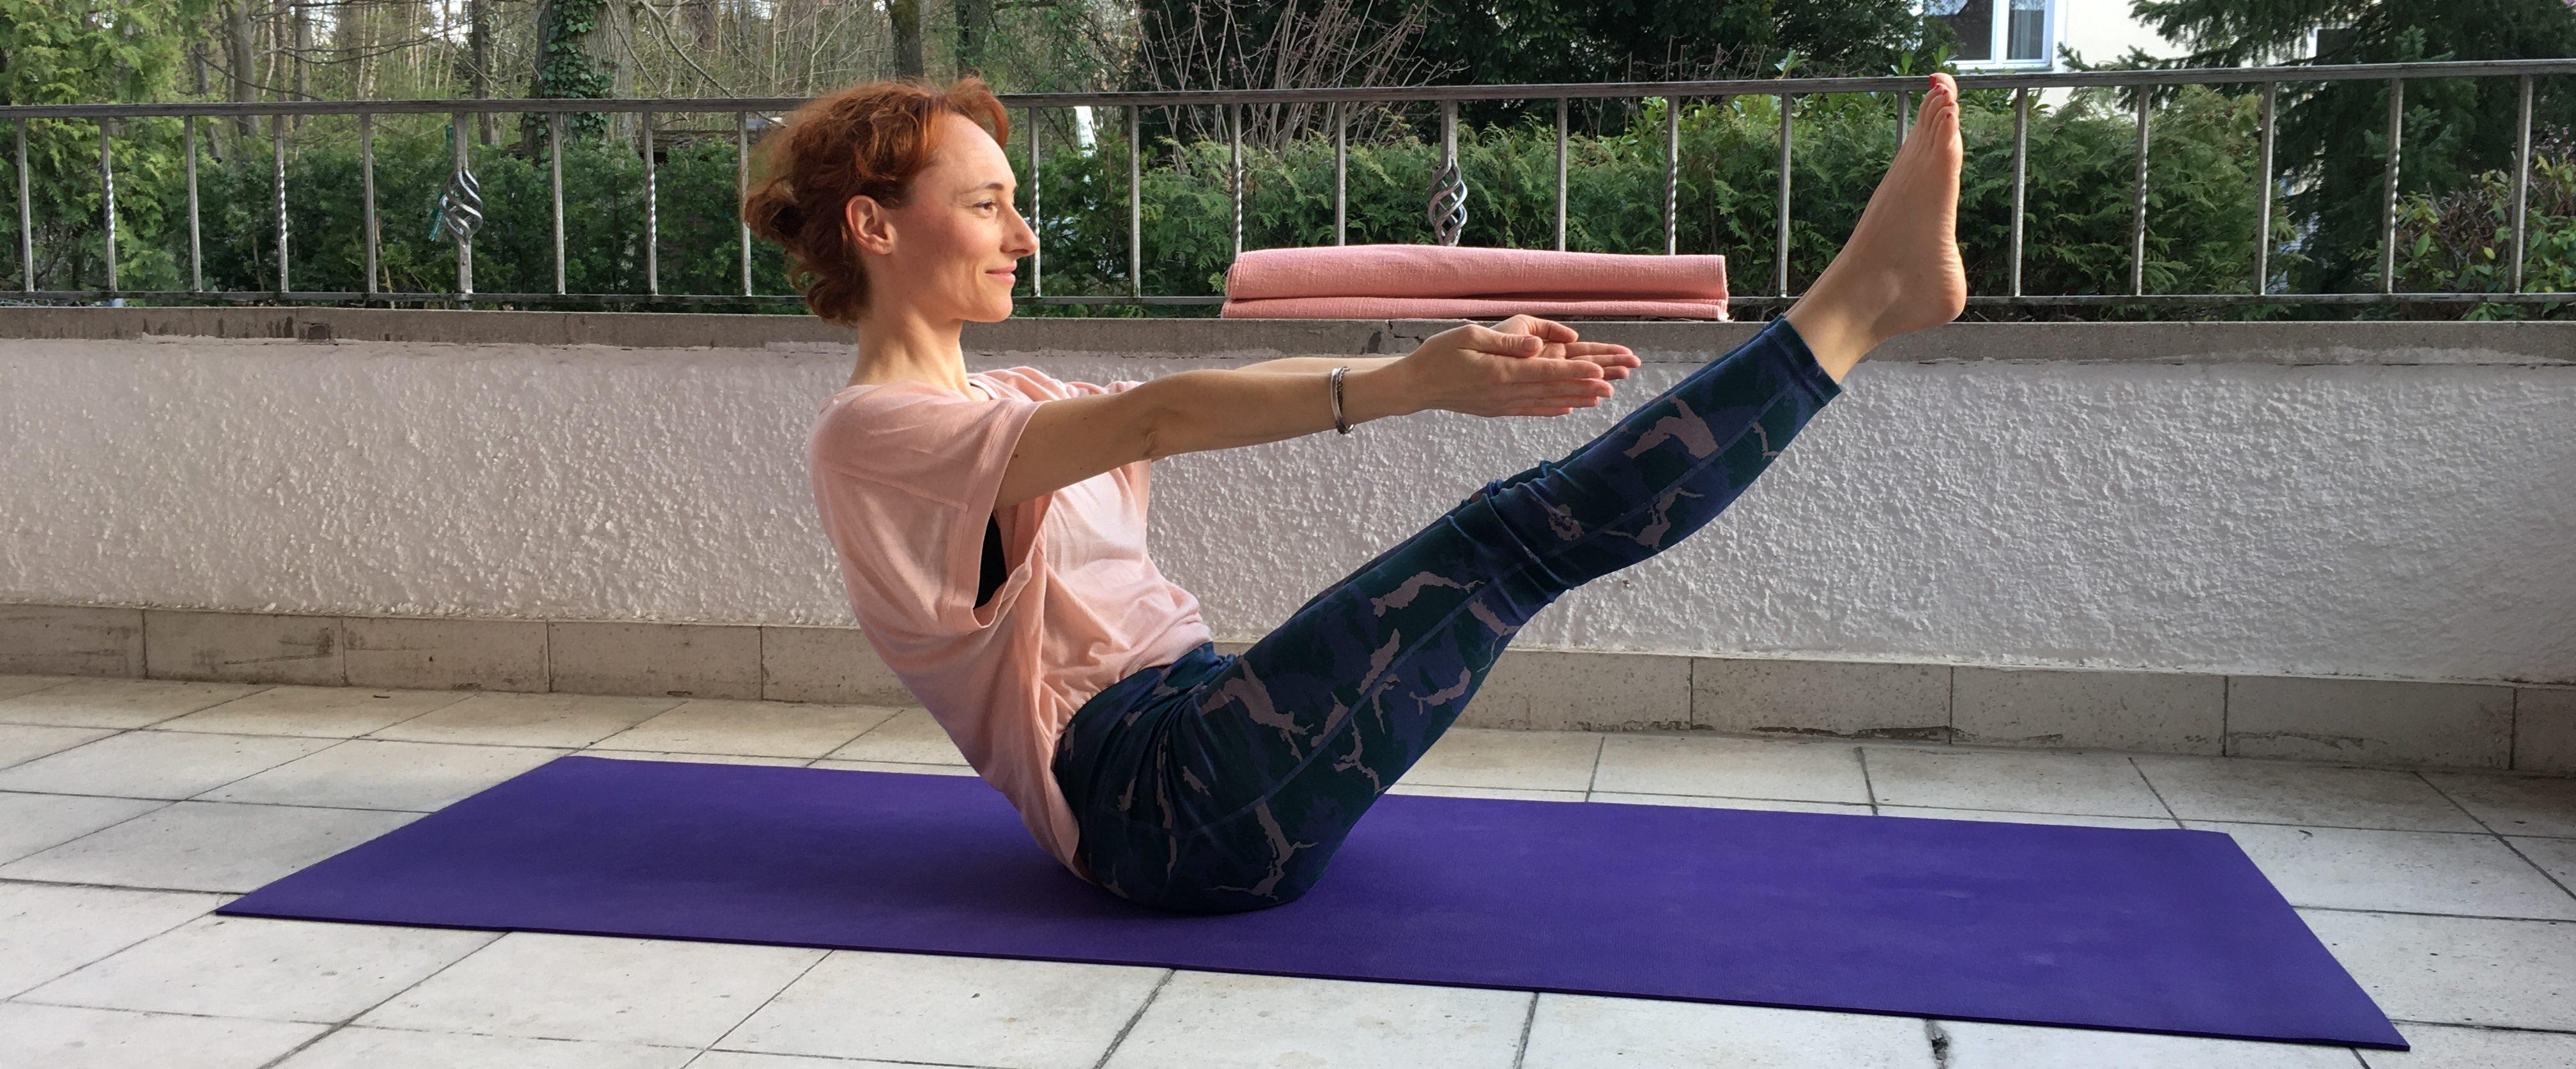 testedcampz: yoga-outfit von super.natural - produkttest